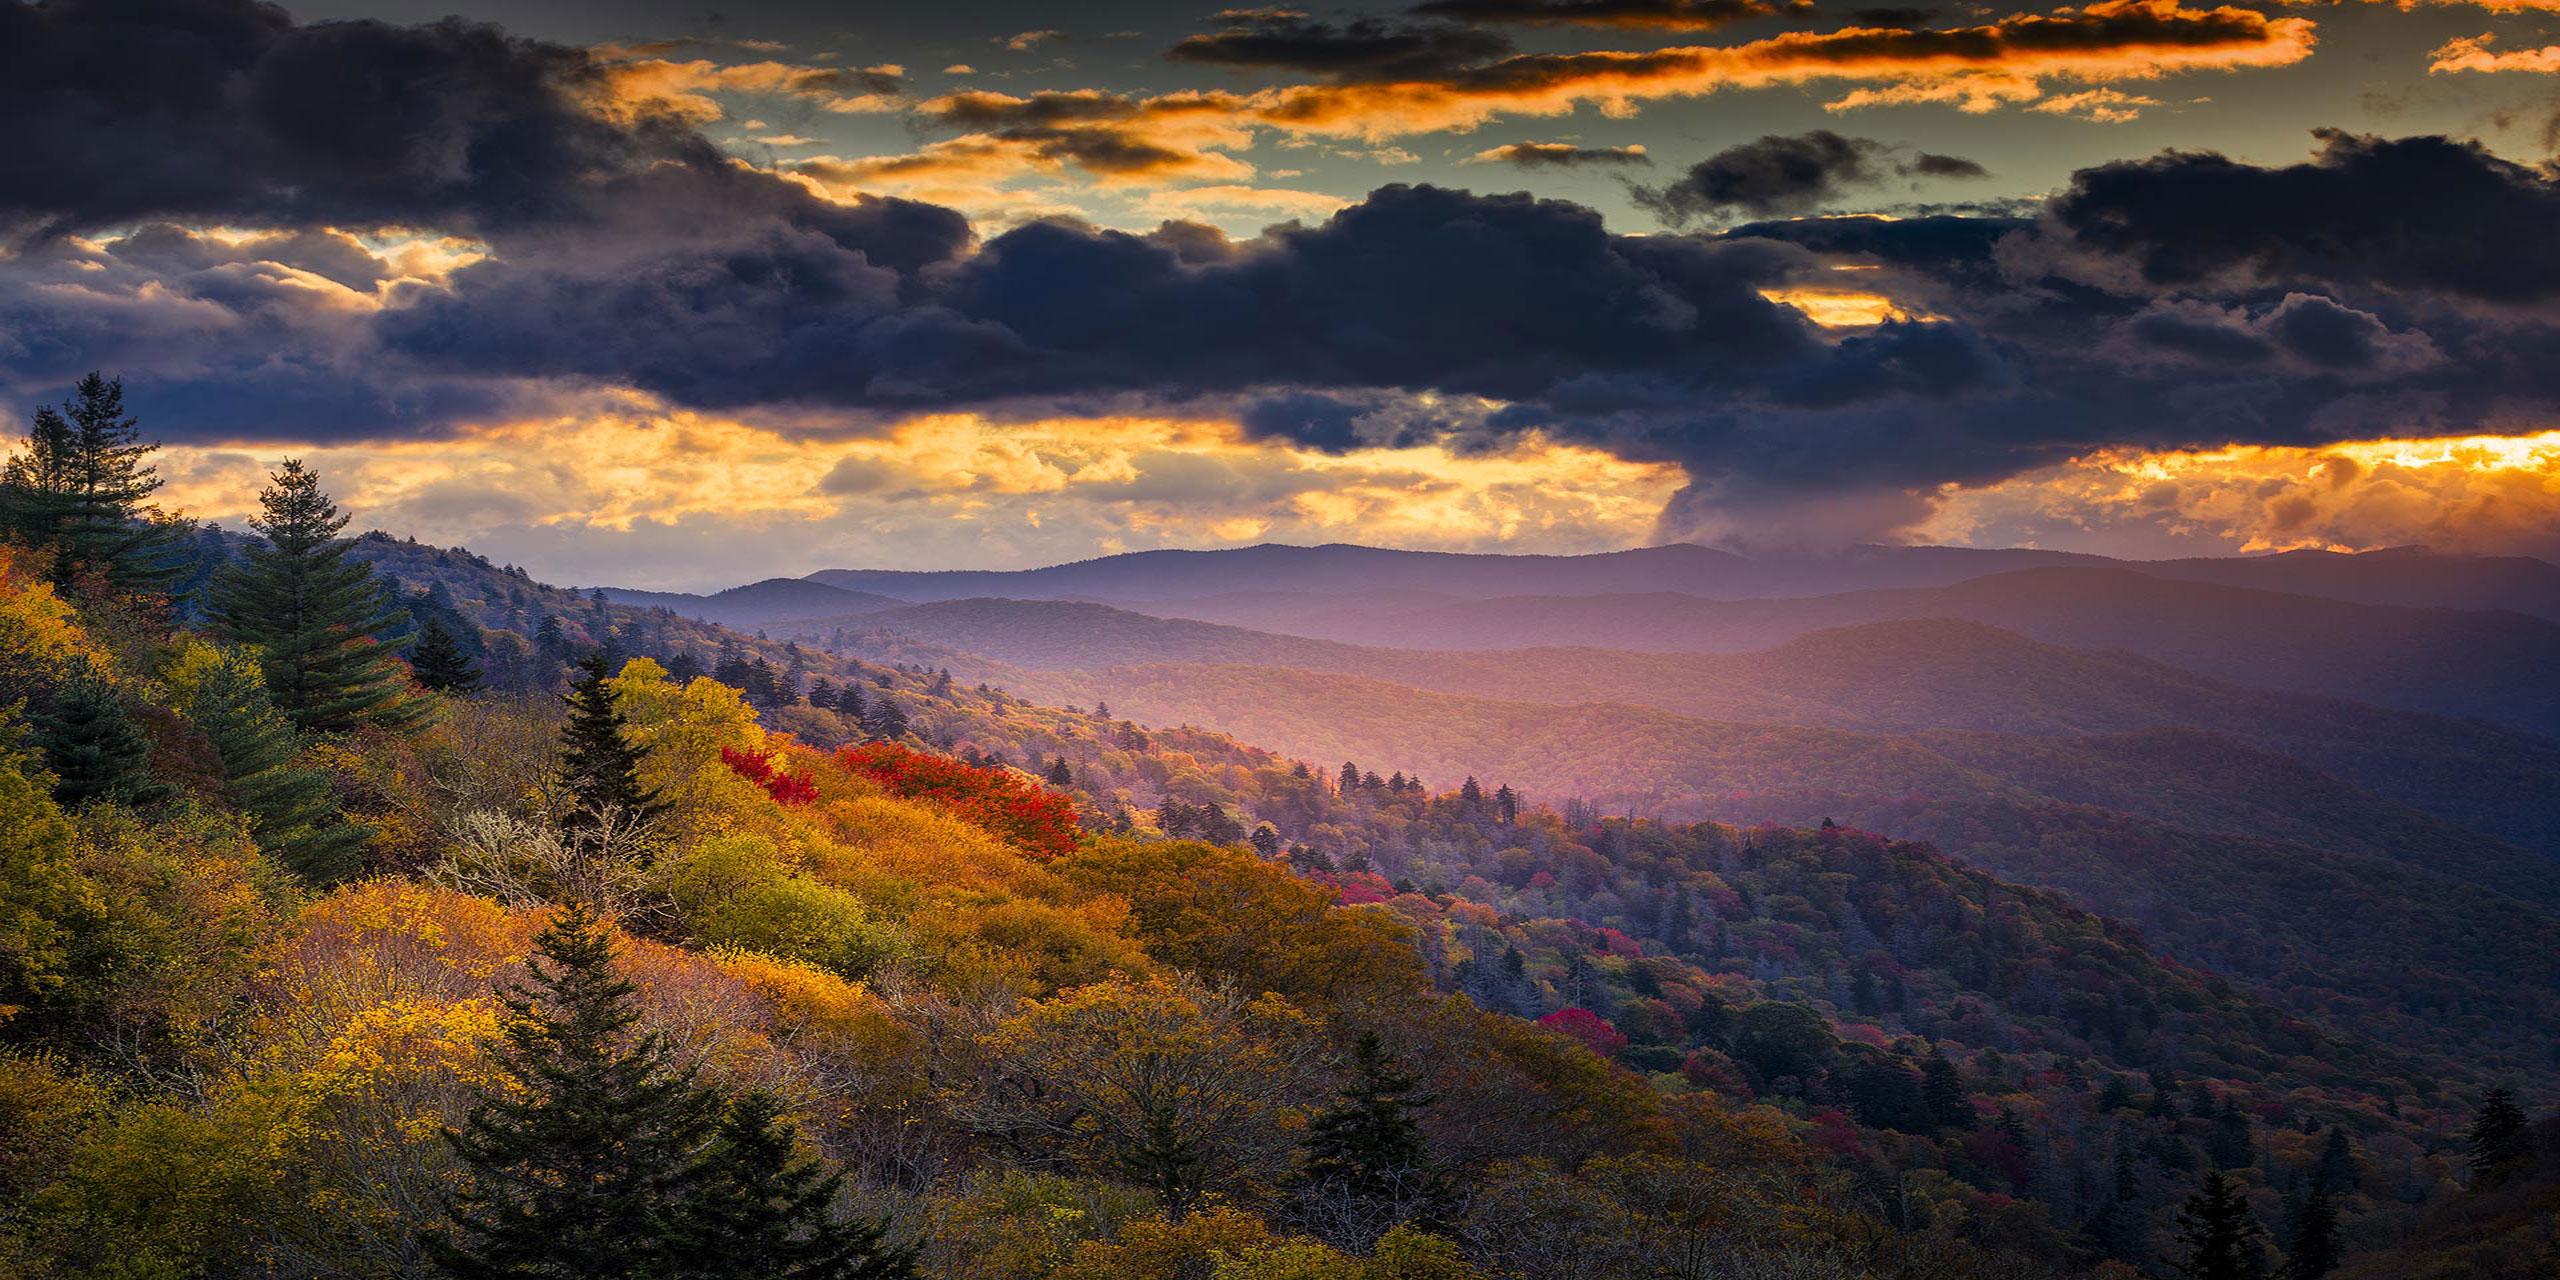 Great Smoky Mountains National Park; Courtesy of Dean Fikar/Shutterstock.com